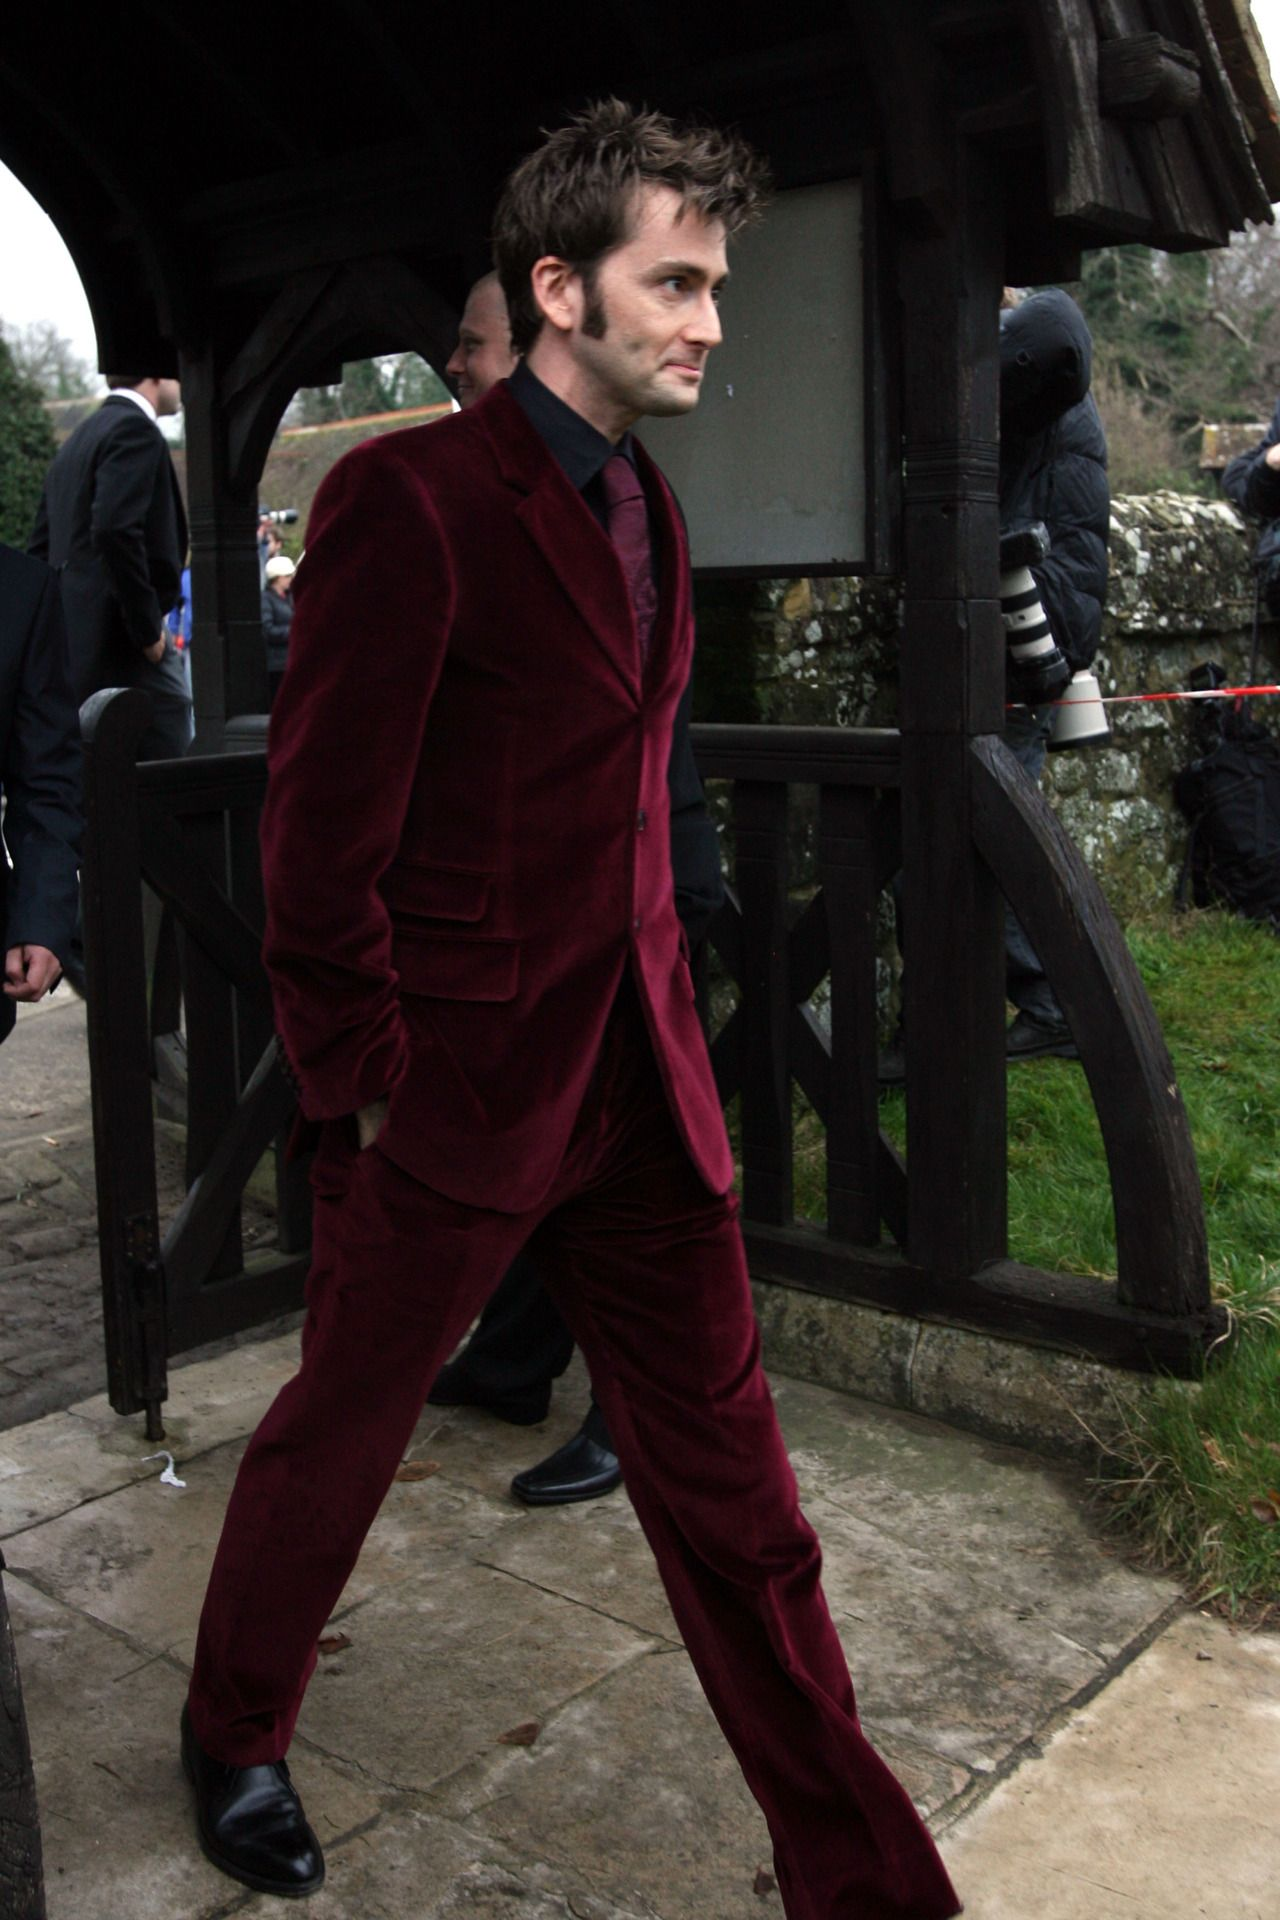 David looks glorious in that suit. Red velvet suit